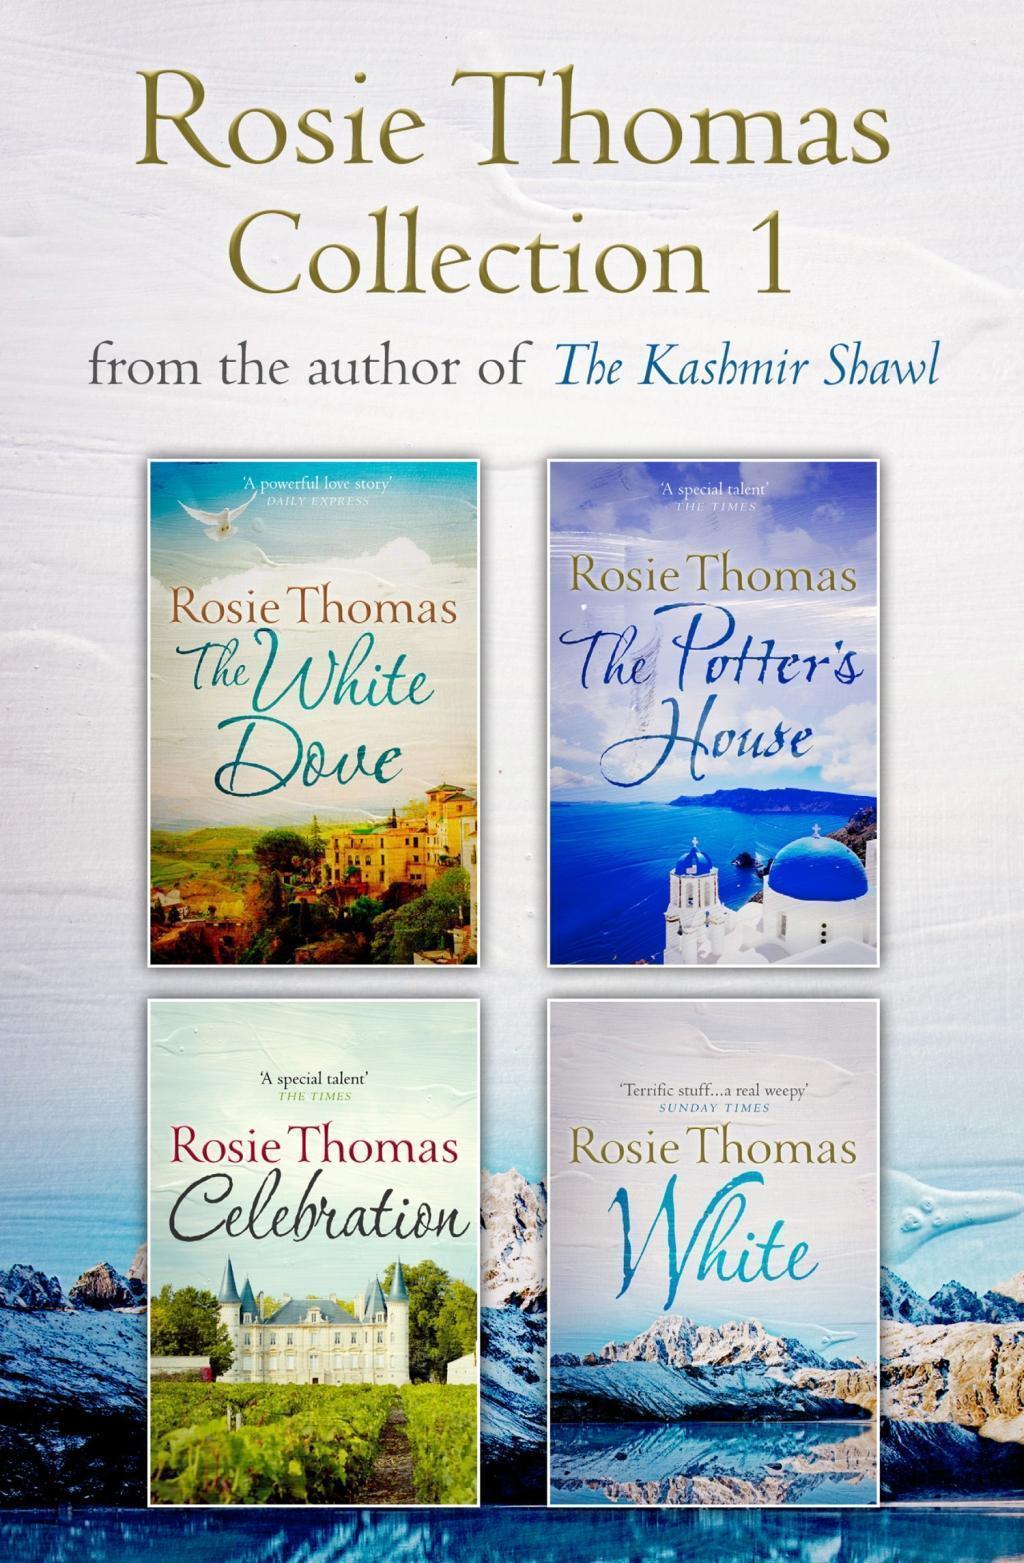 Rosie Thomas 4-Book Collection: The White Dove, The Potter's House, Celebration, White